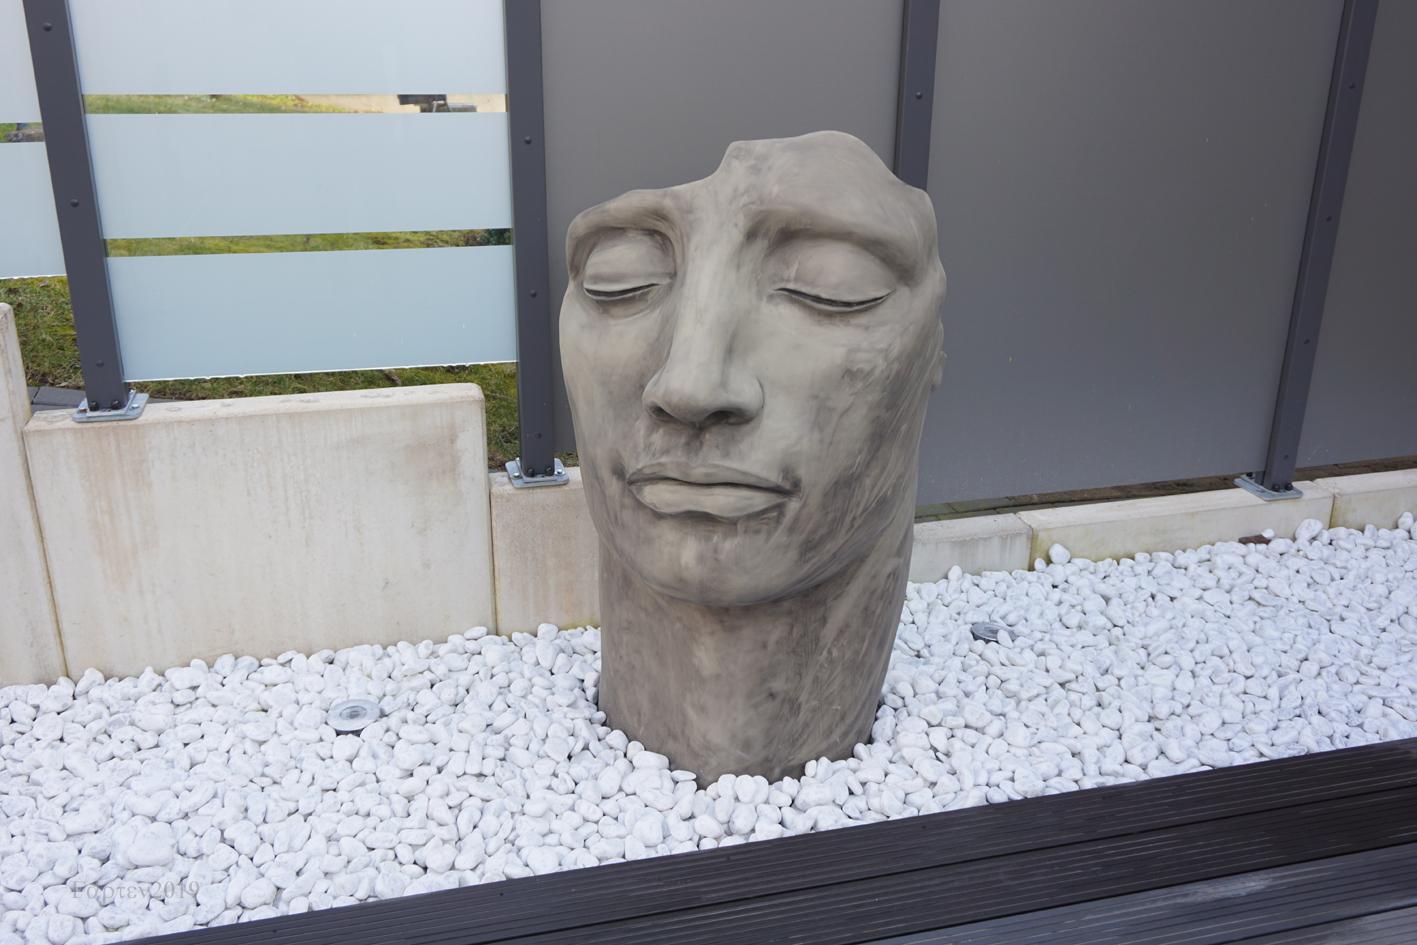 Gesicht-1bHayIAPHG7t2I